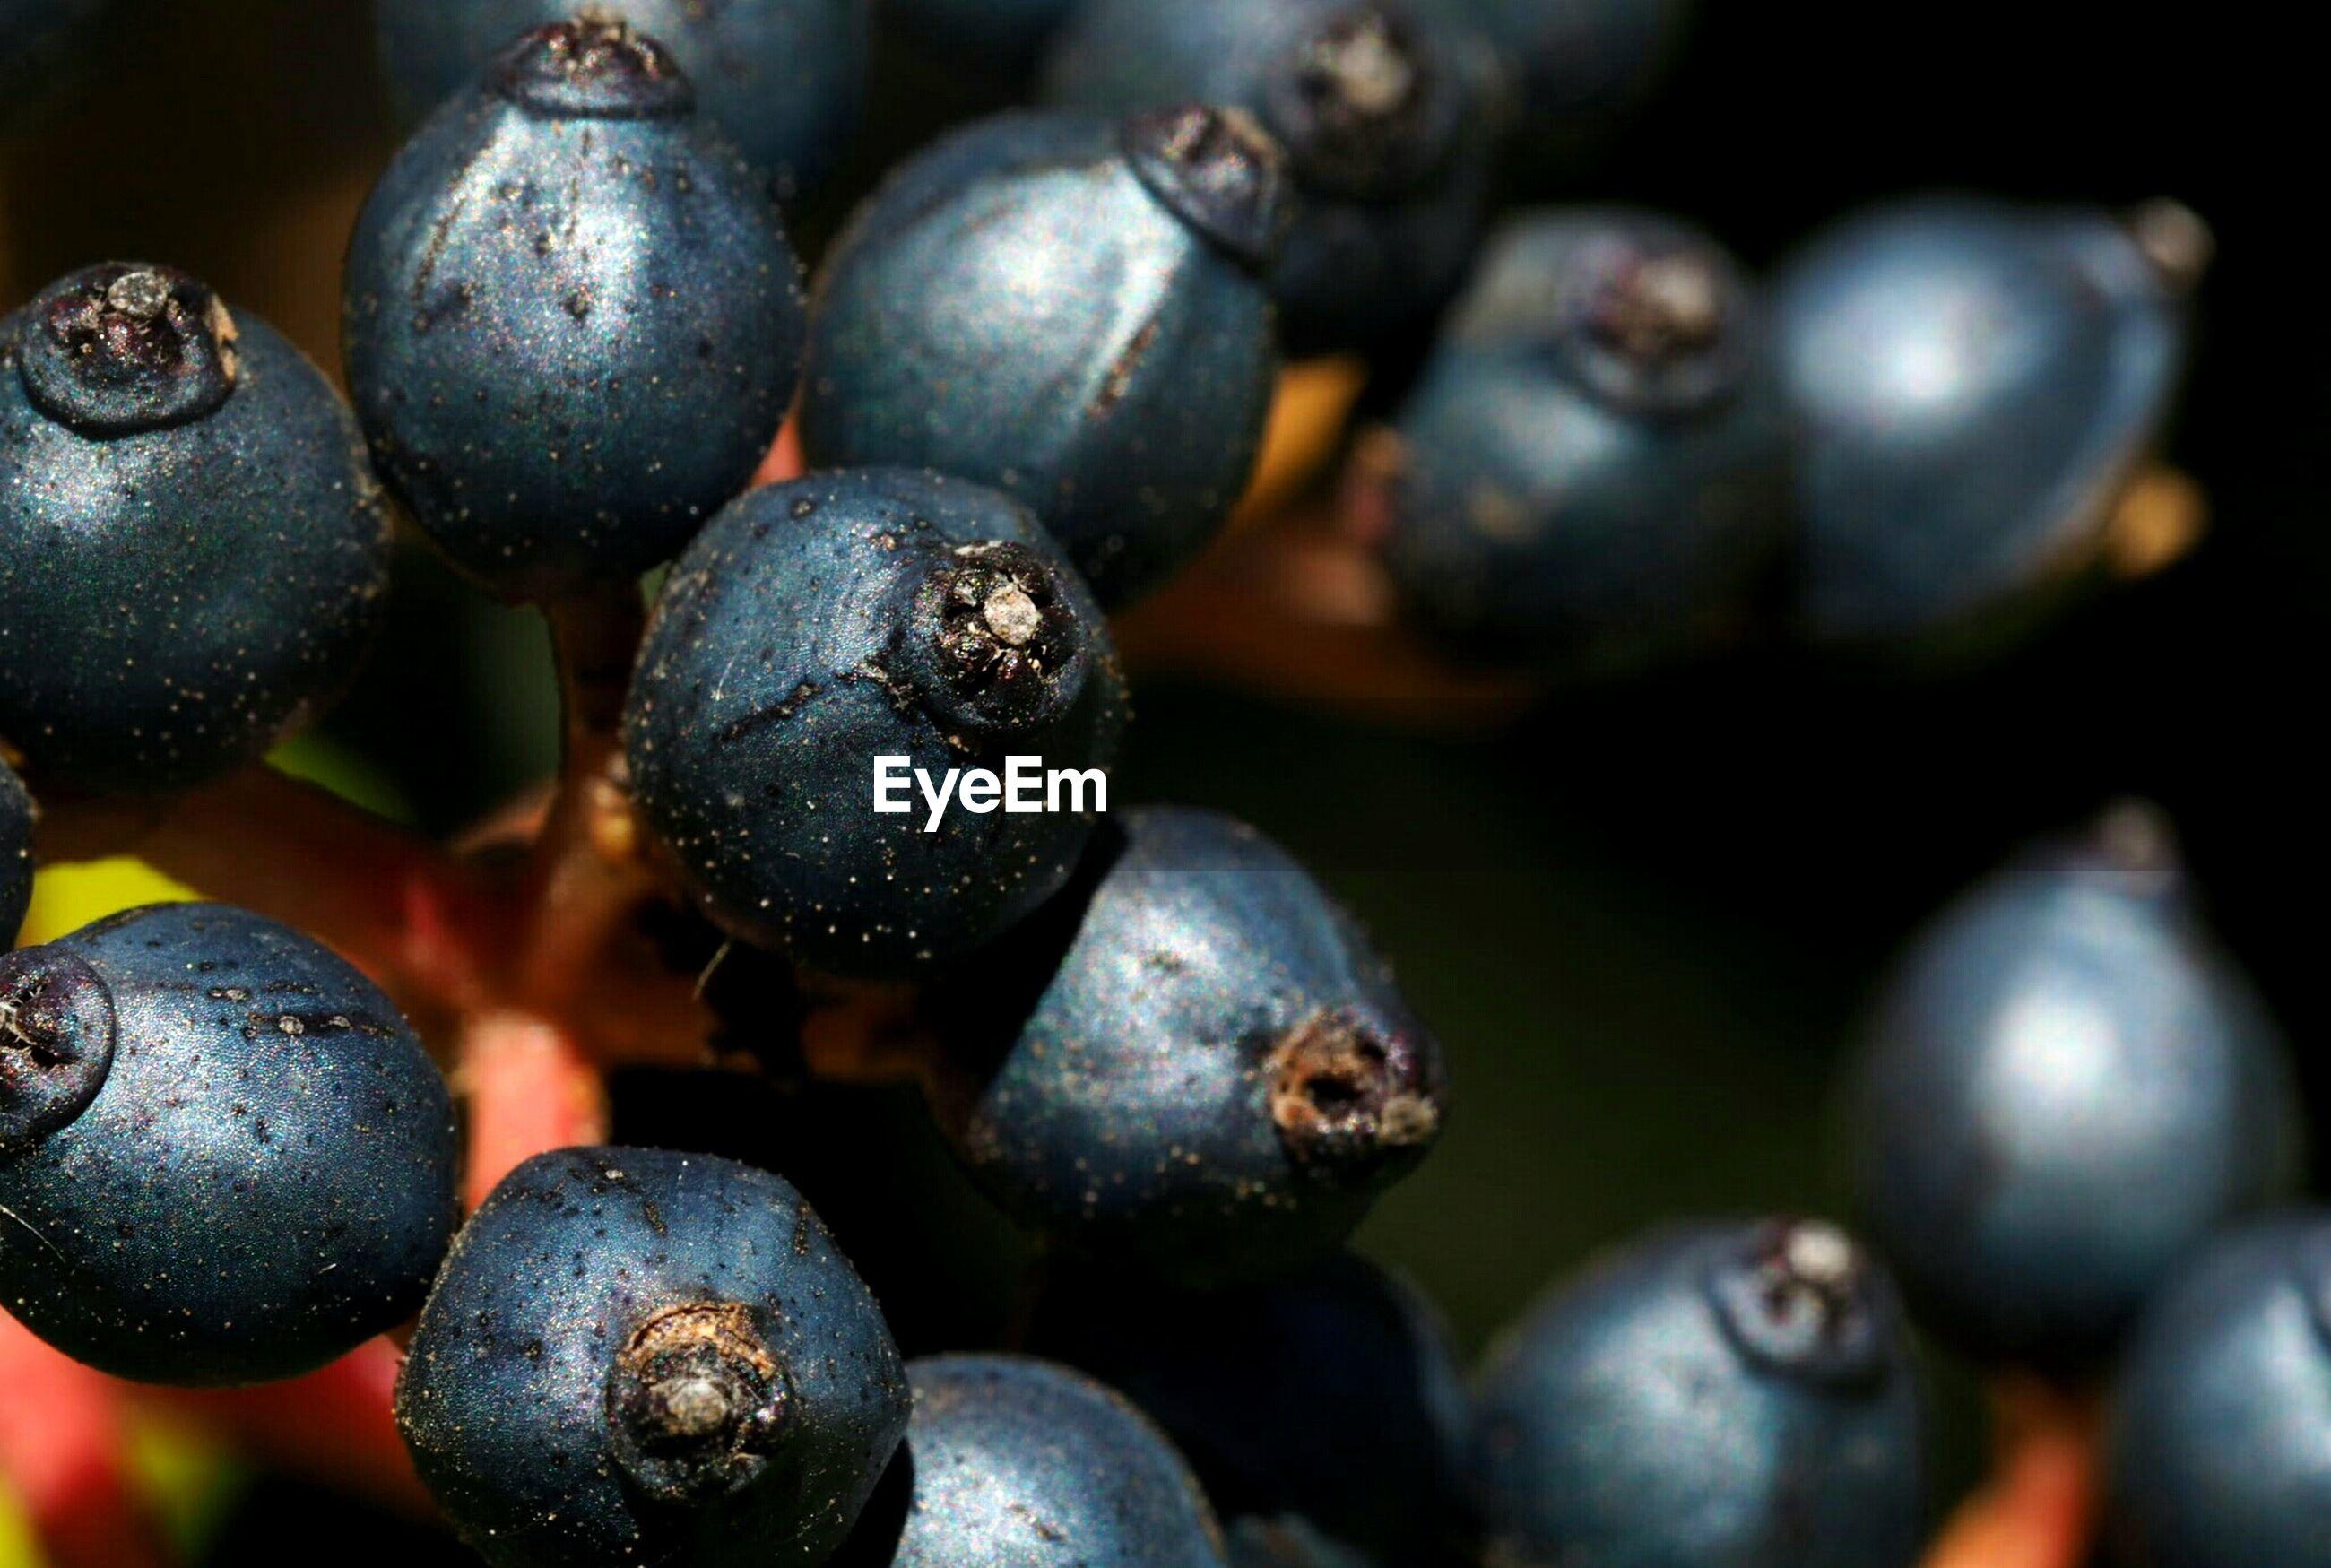 Close-up of fruits growing at night